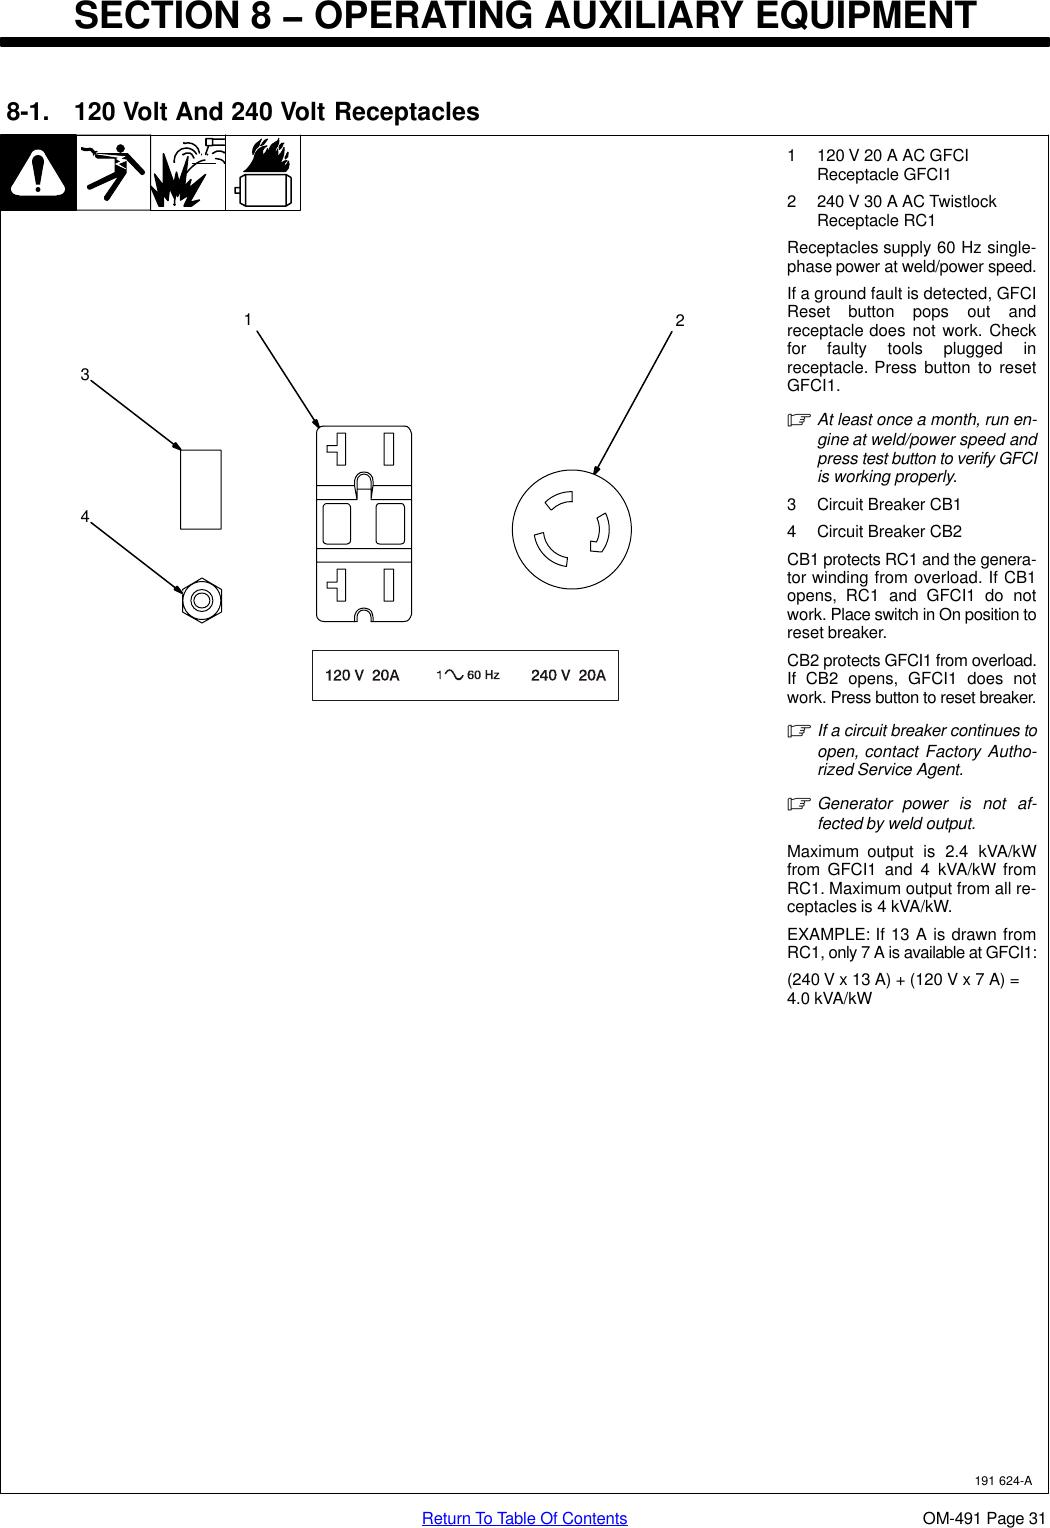 Miller Electric Big Blue 402P Users Manual O491ap_mil on